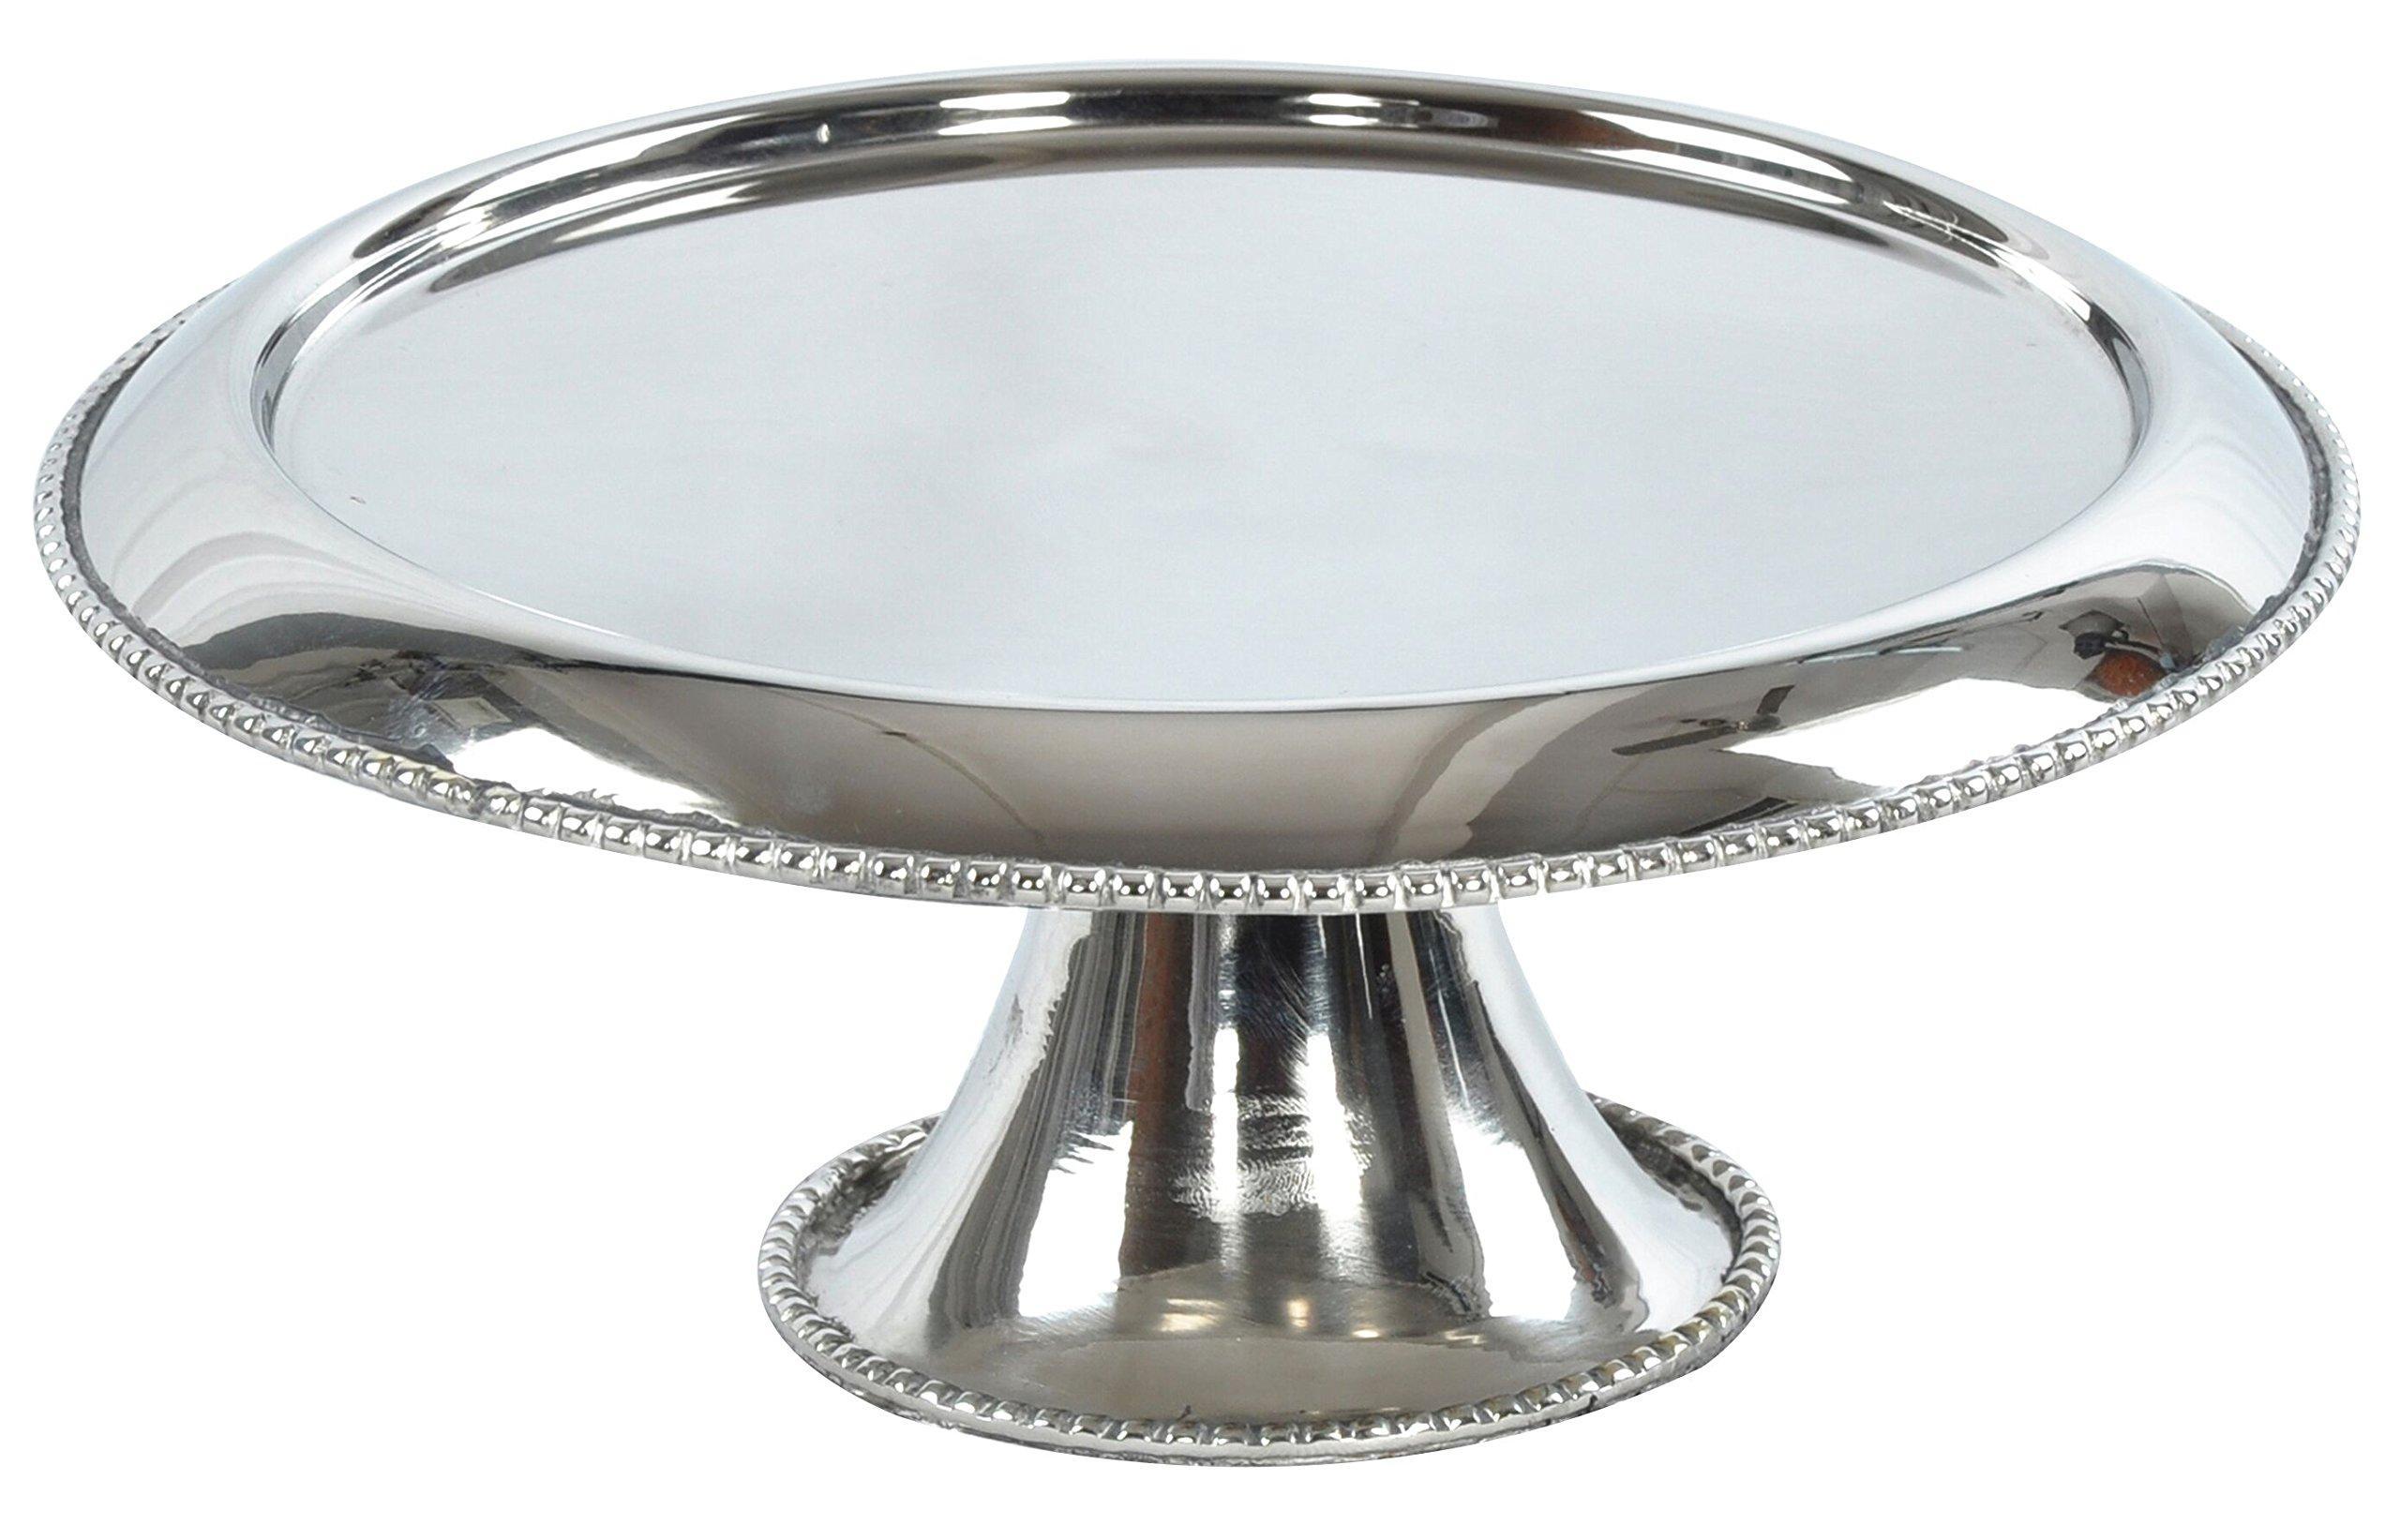 Zuni 9x4 Footed Cake Display, dessert Plate w/ feet Stainless Steel Beaded edge